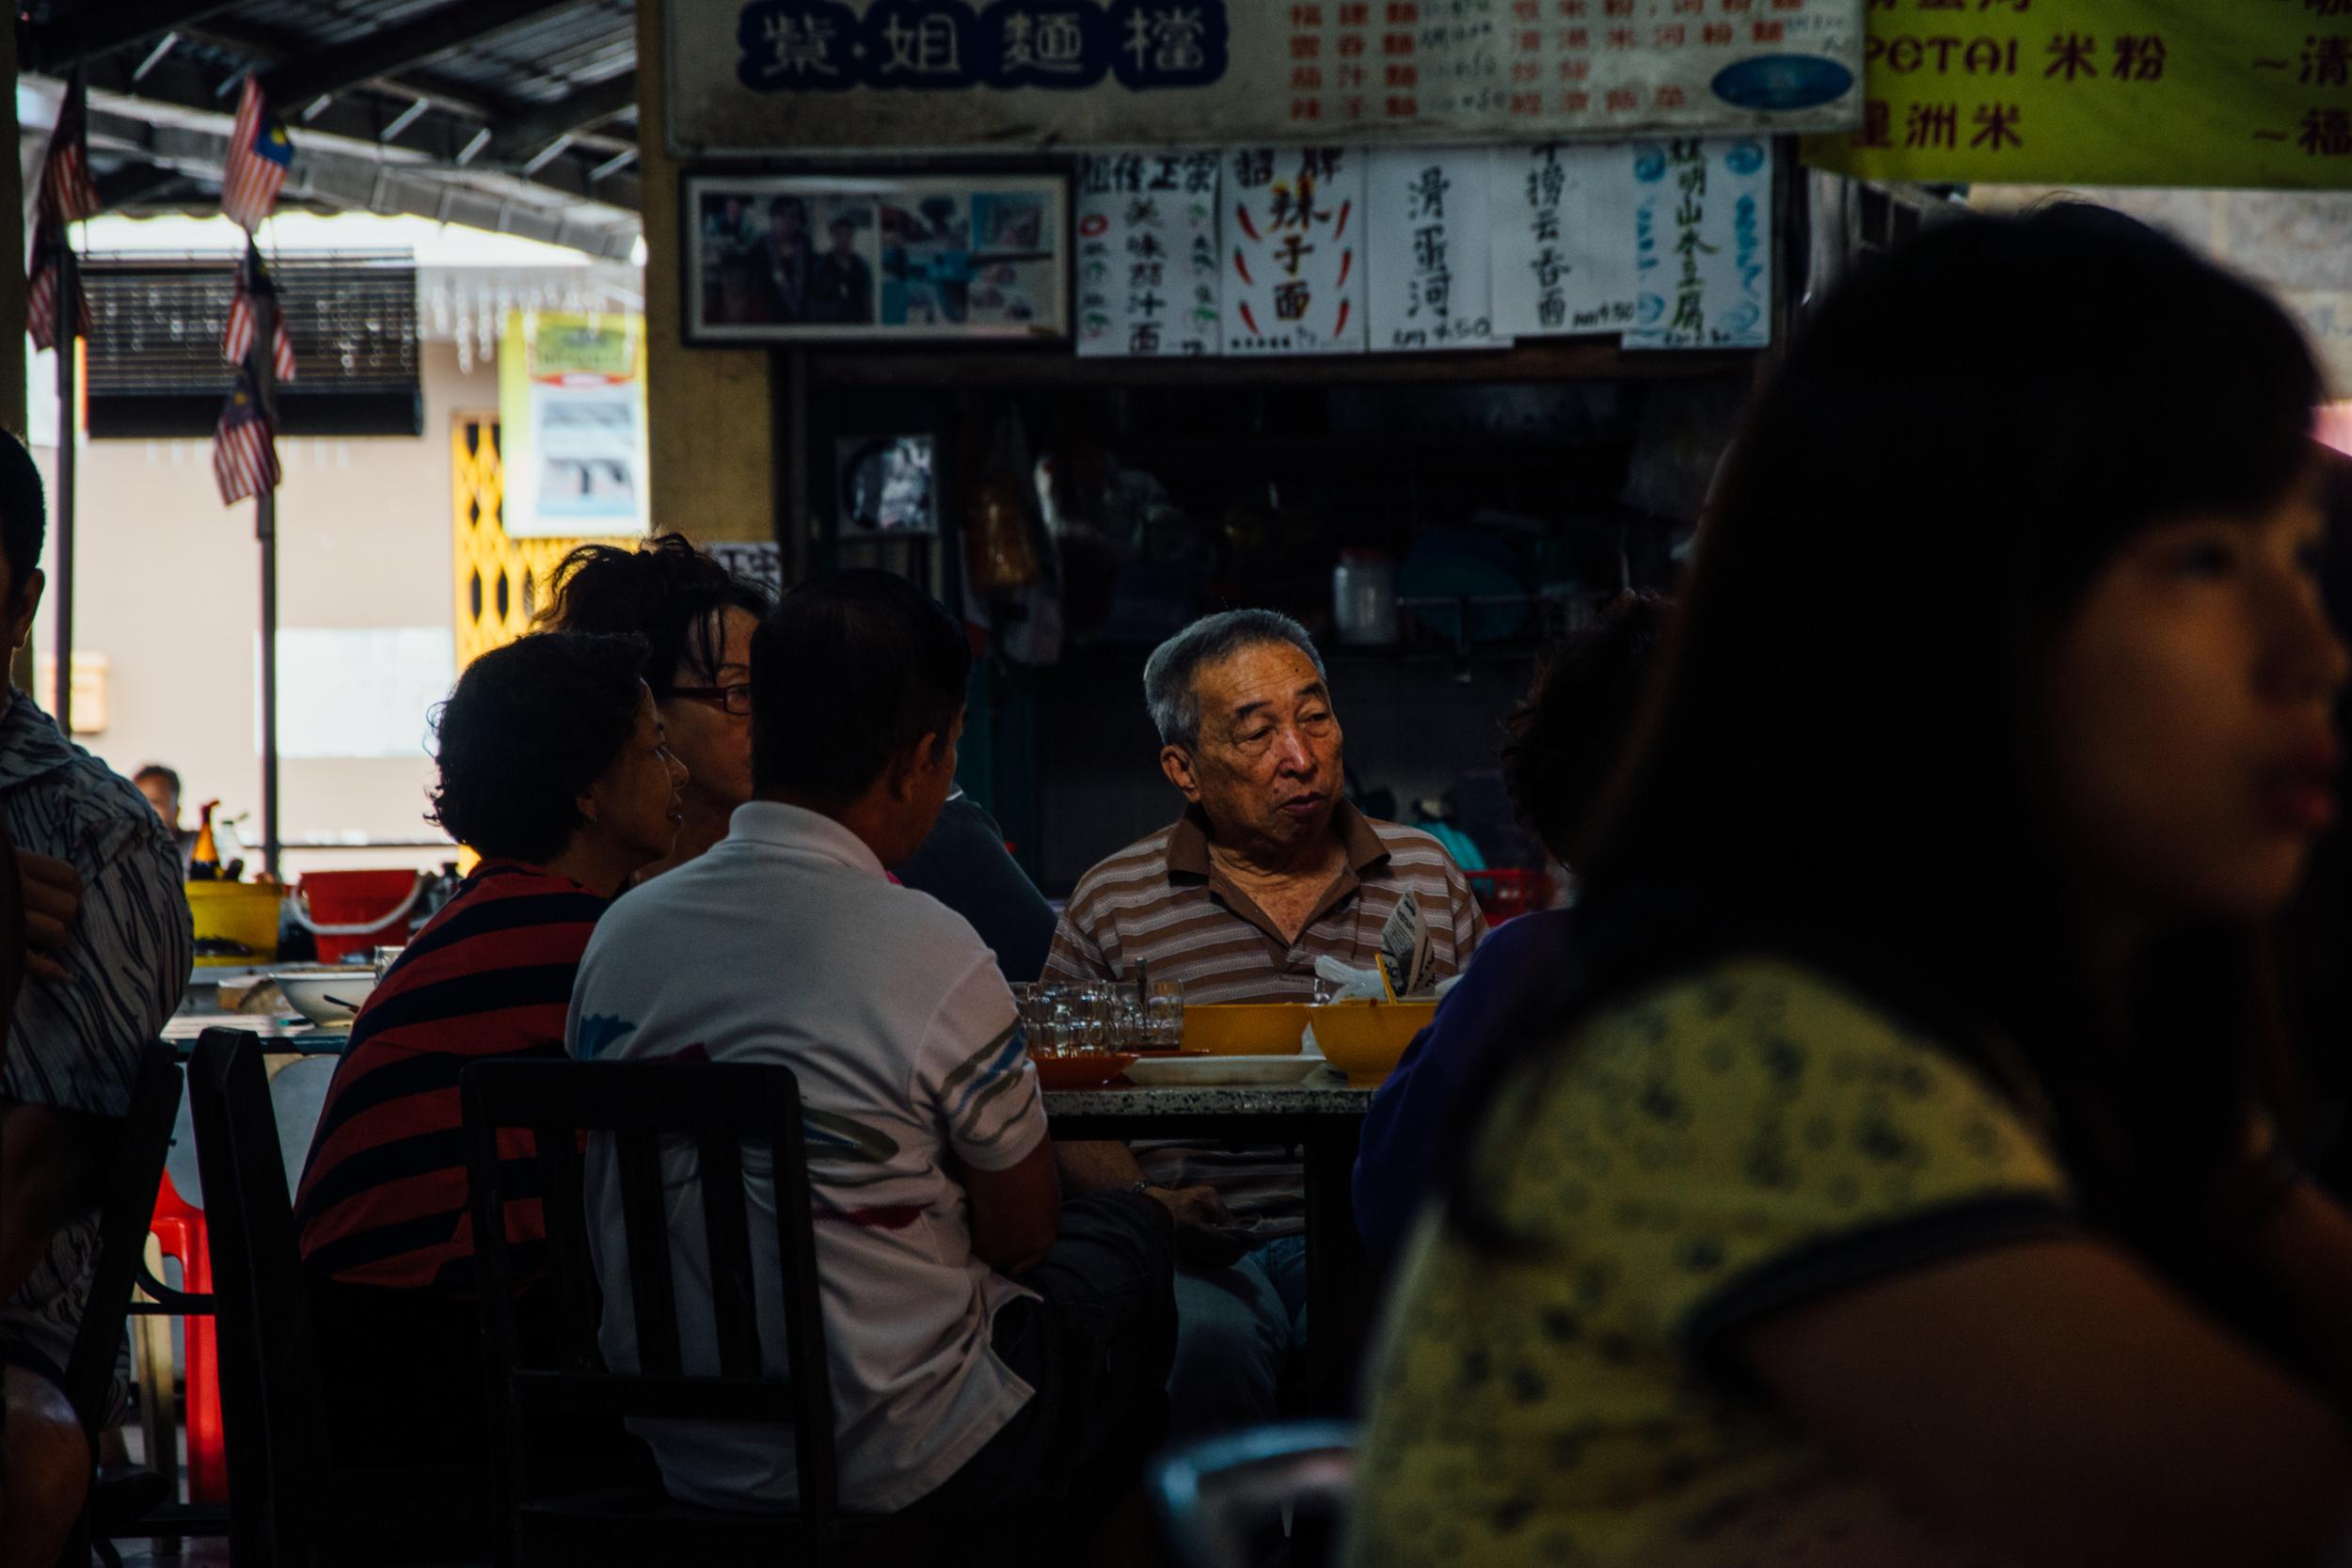 Sg. Lembing Malaysia 2015 | A Beautiful Distraction